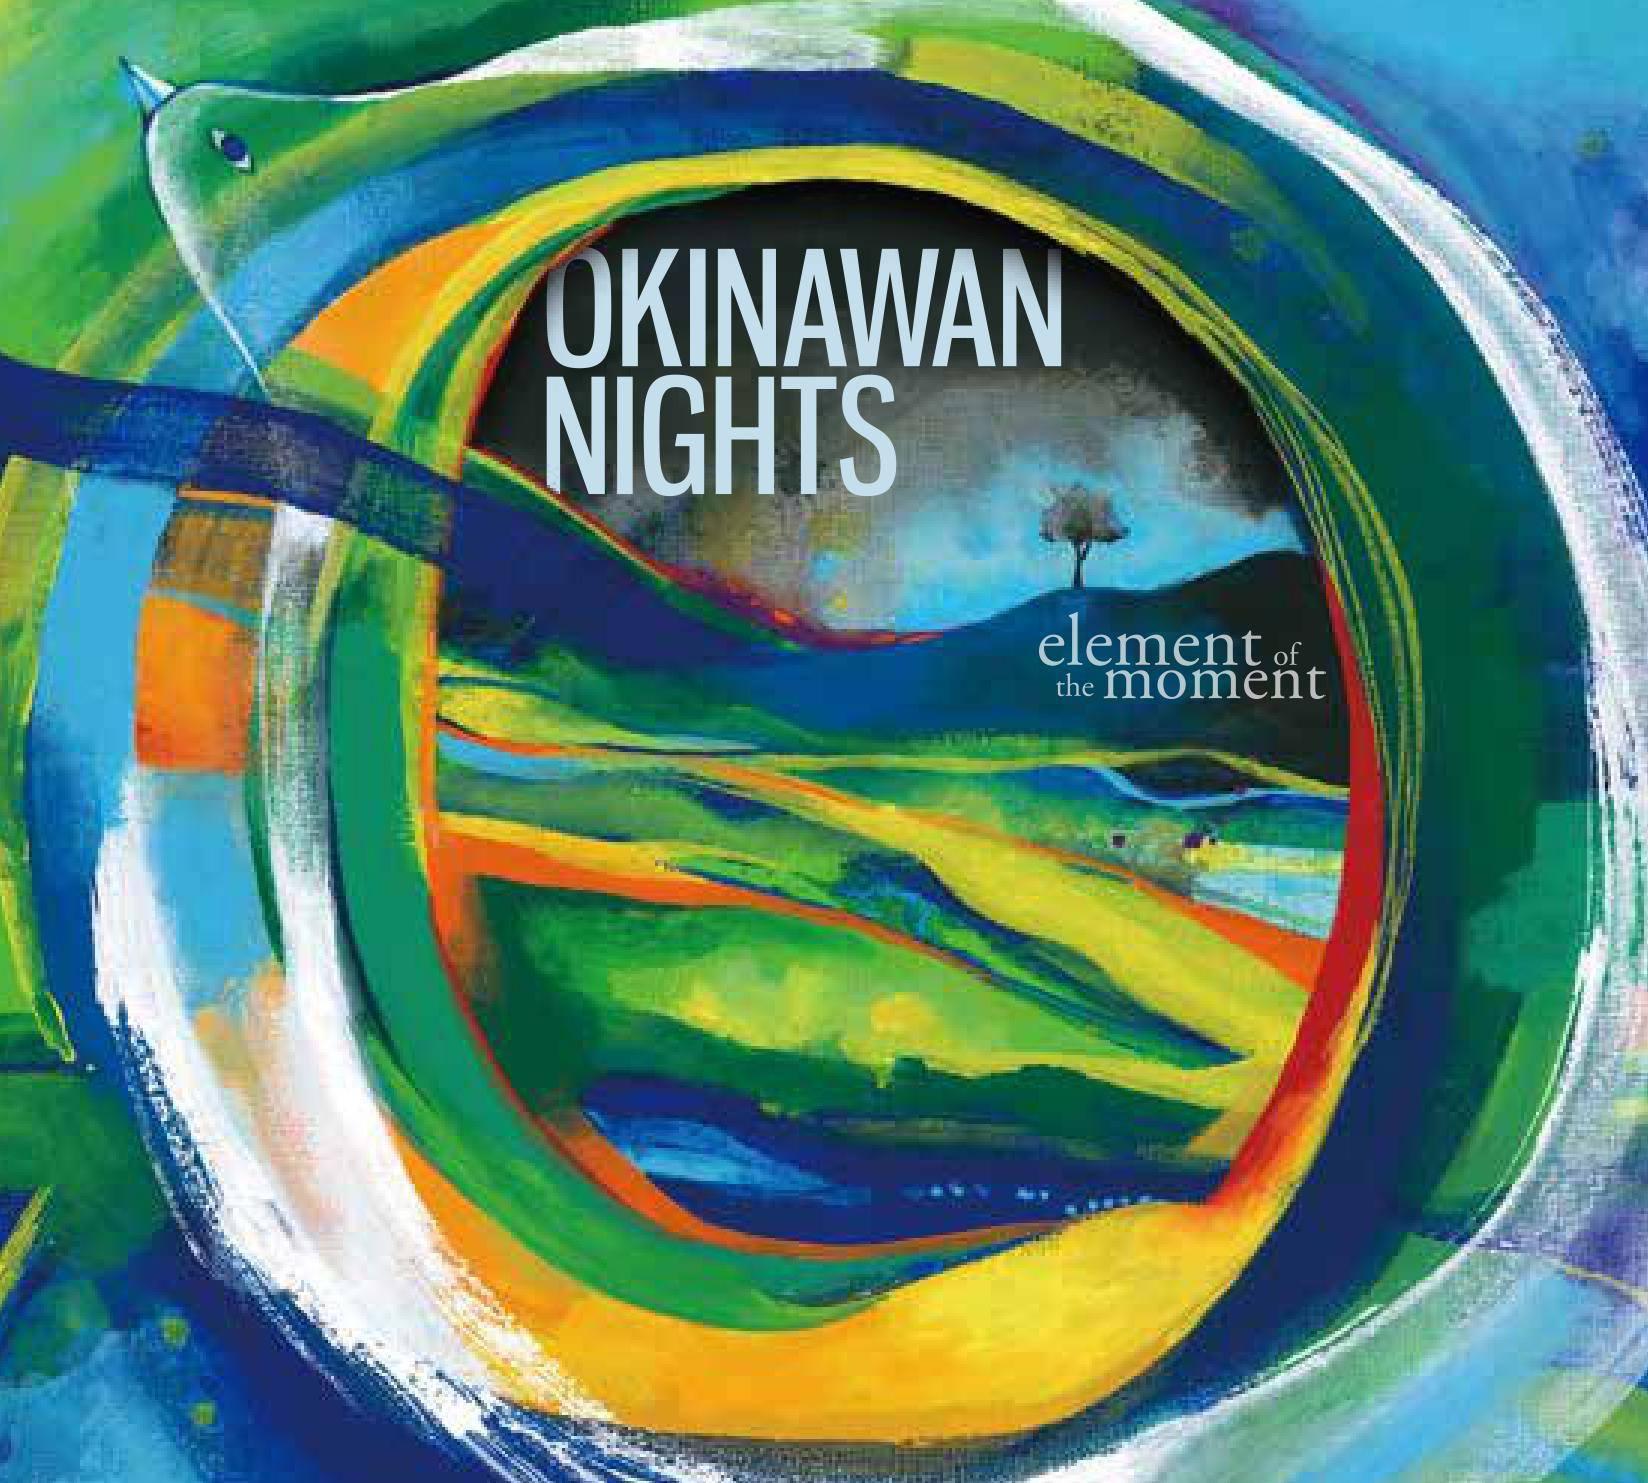 【CD】element of the moment「OKINAWAN NIGHTS」(沖縄 / Okinawa)